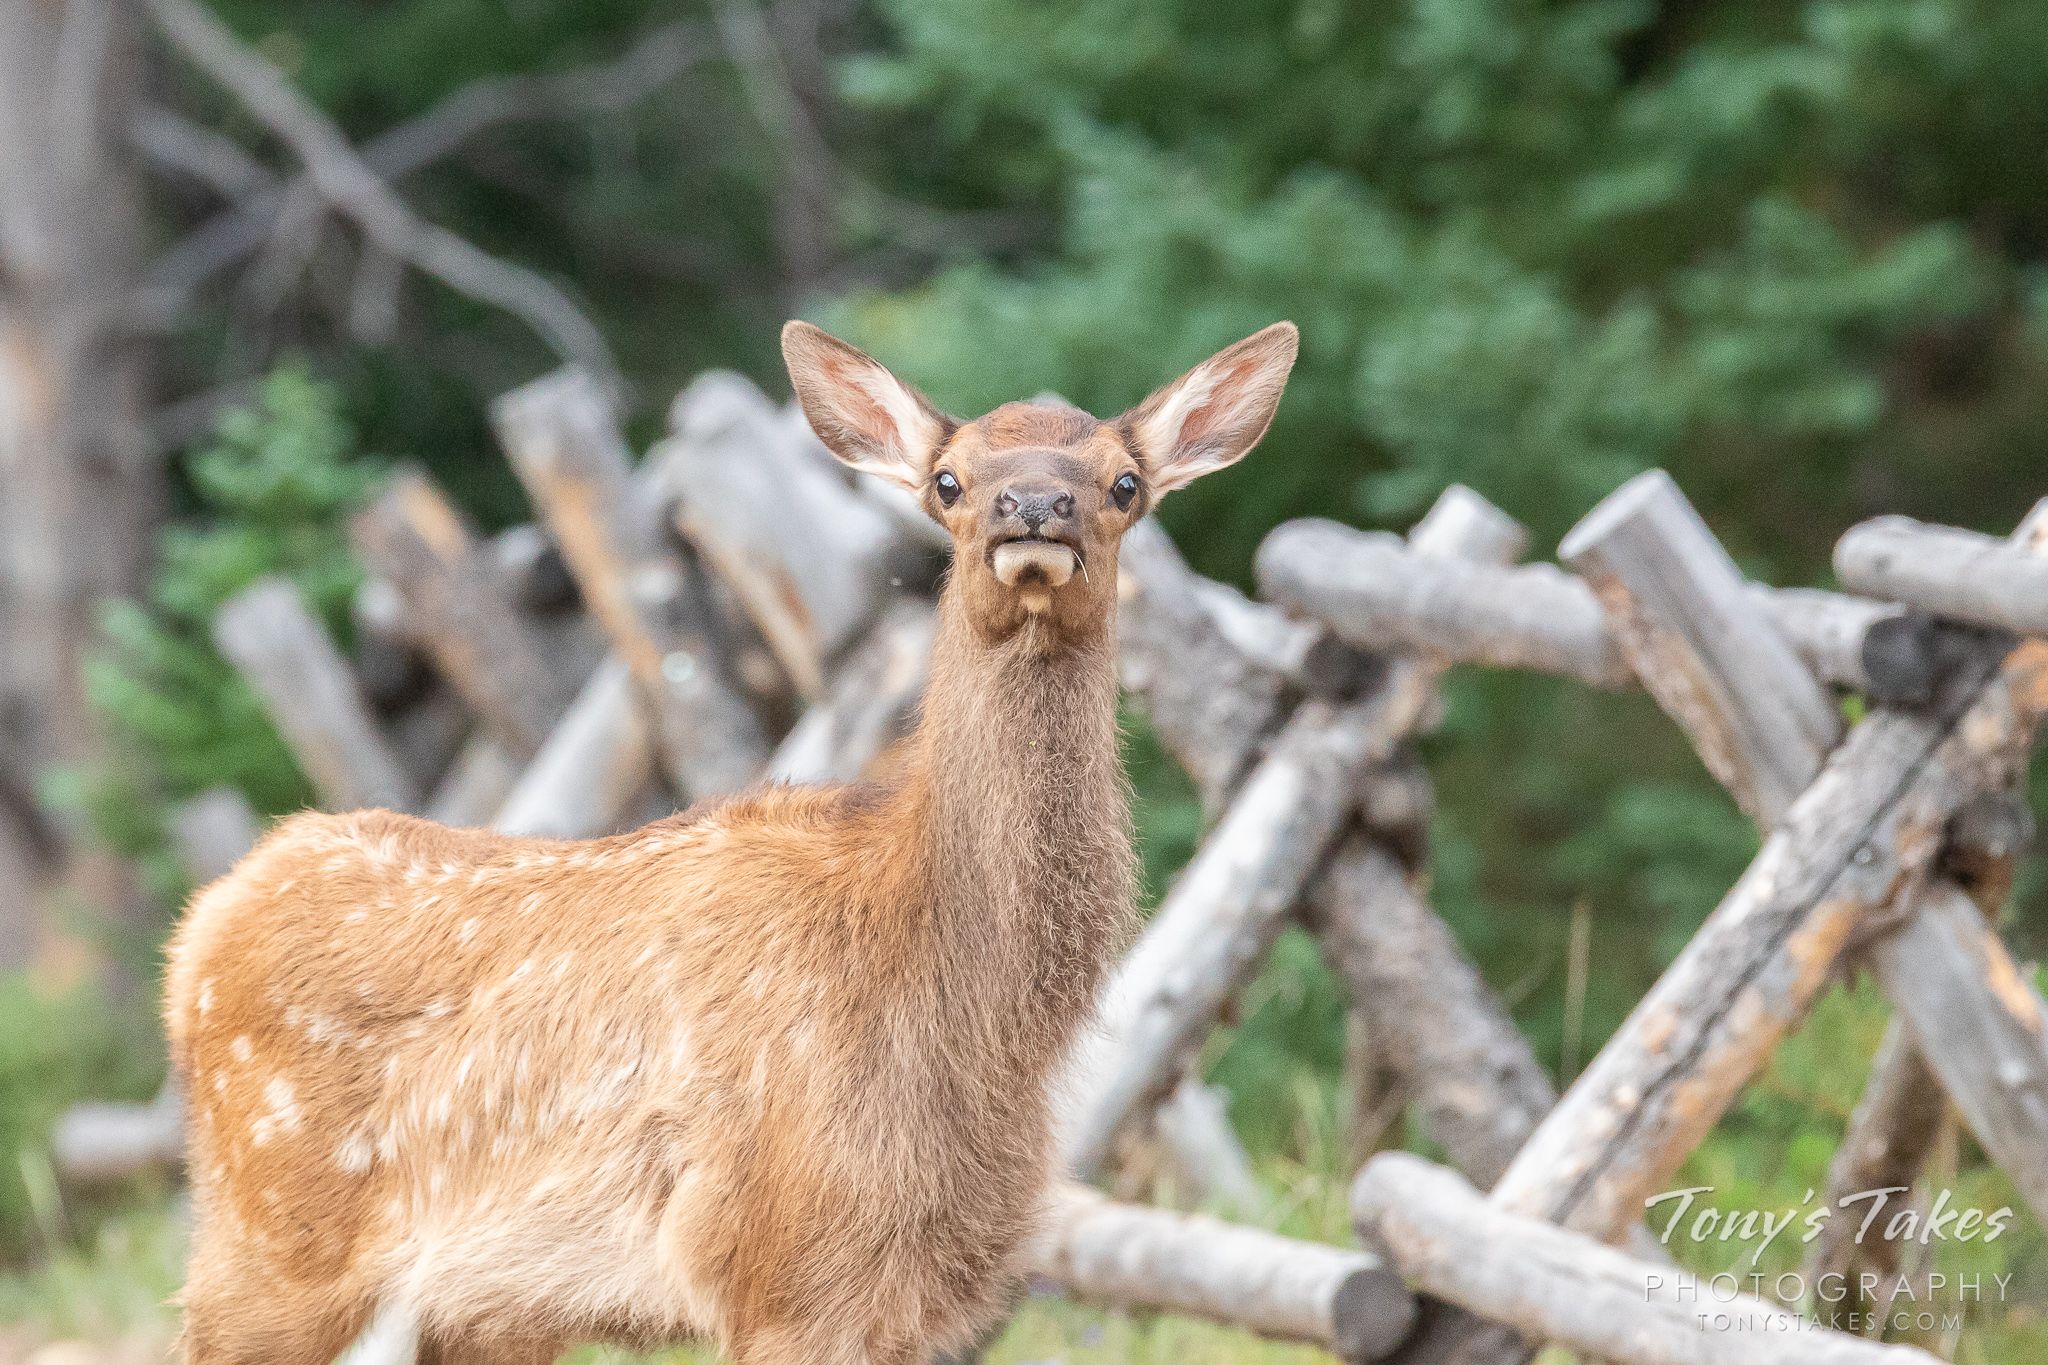 Curious little Elk calf checks out the photographer